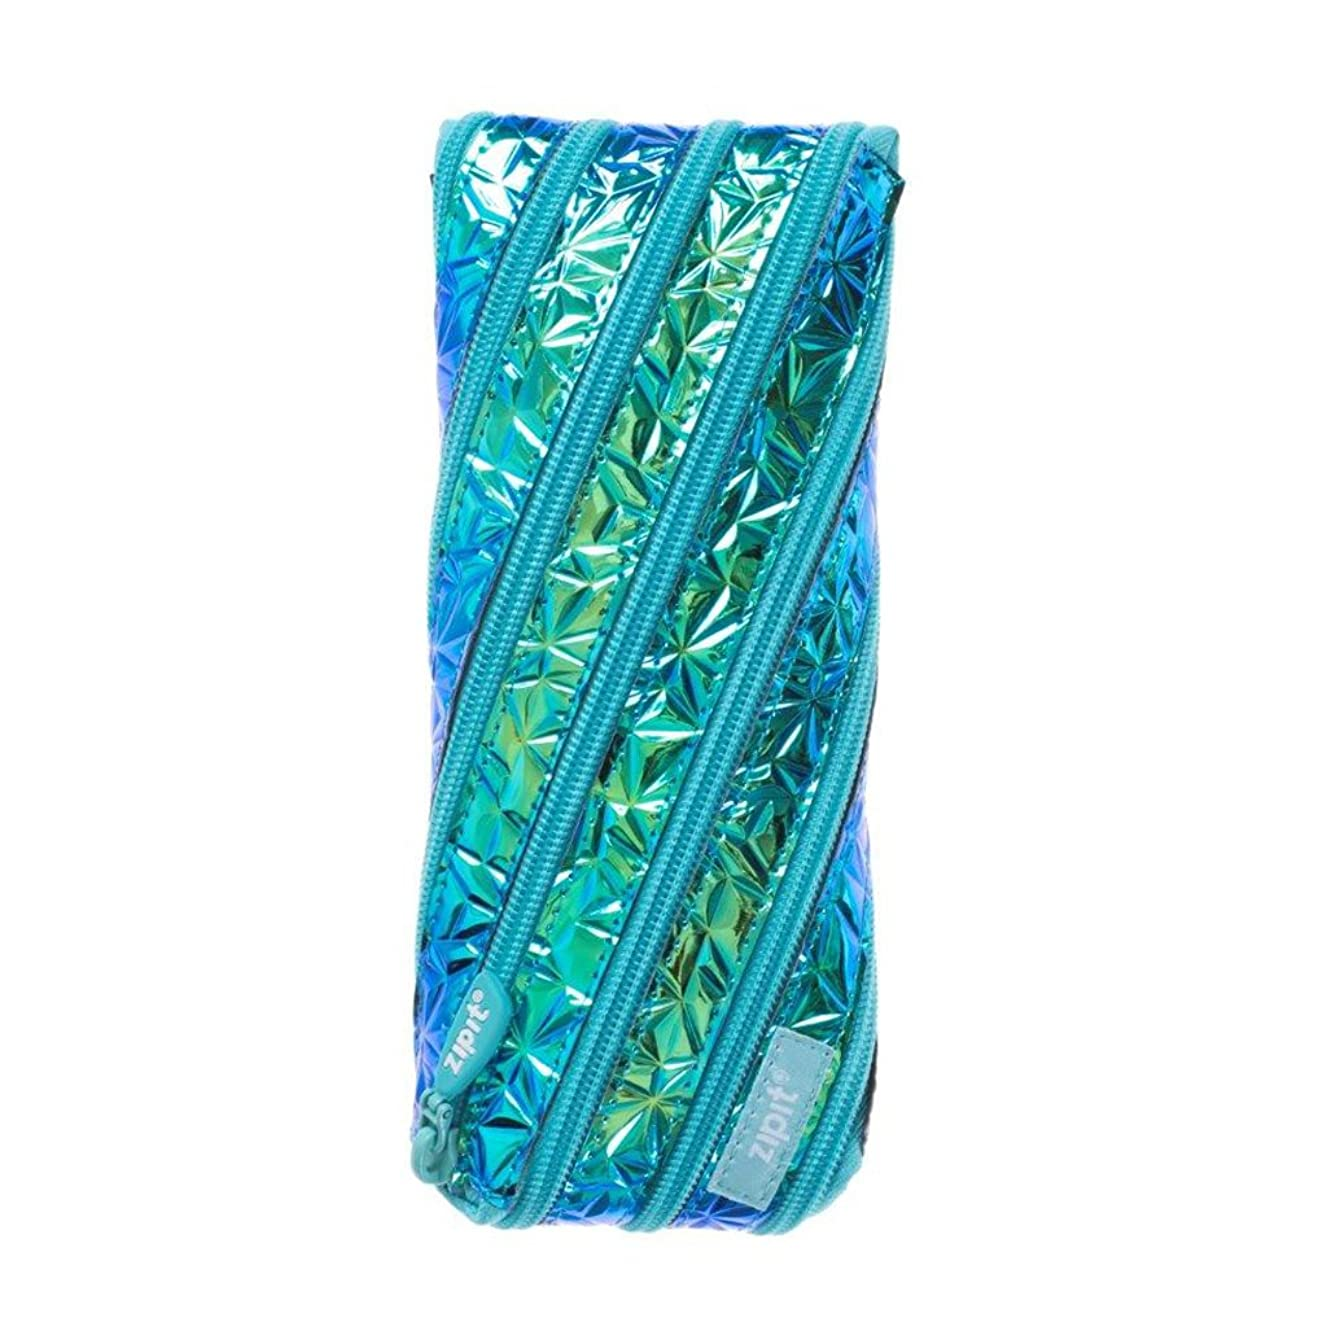 ZIPIT Metallic Pencil Case/Cosmetic Makeup Bag, Blue-Green